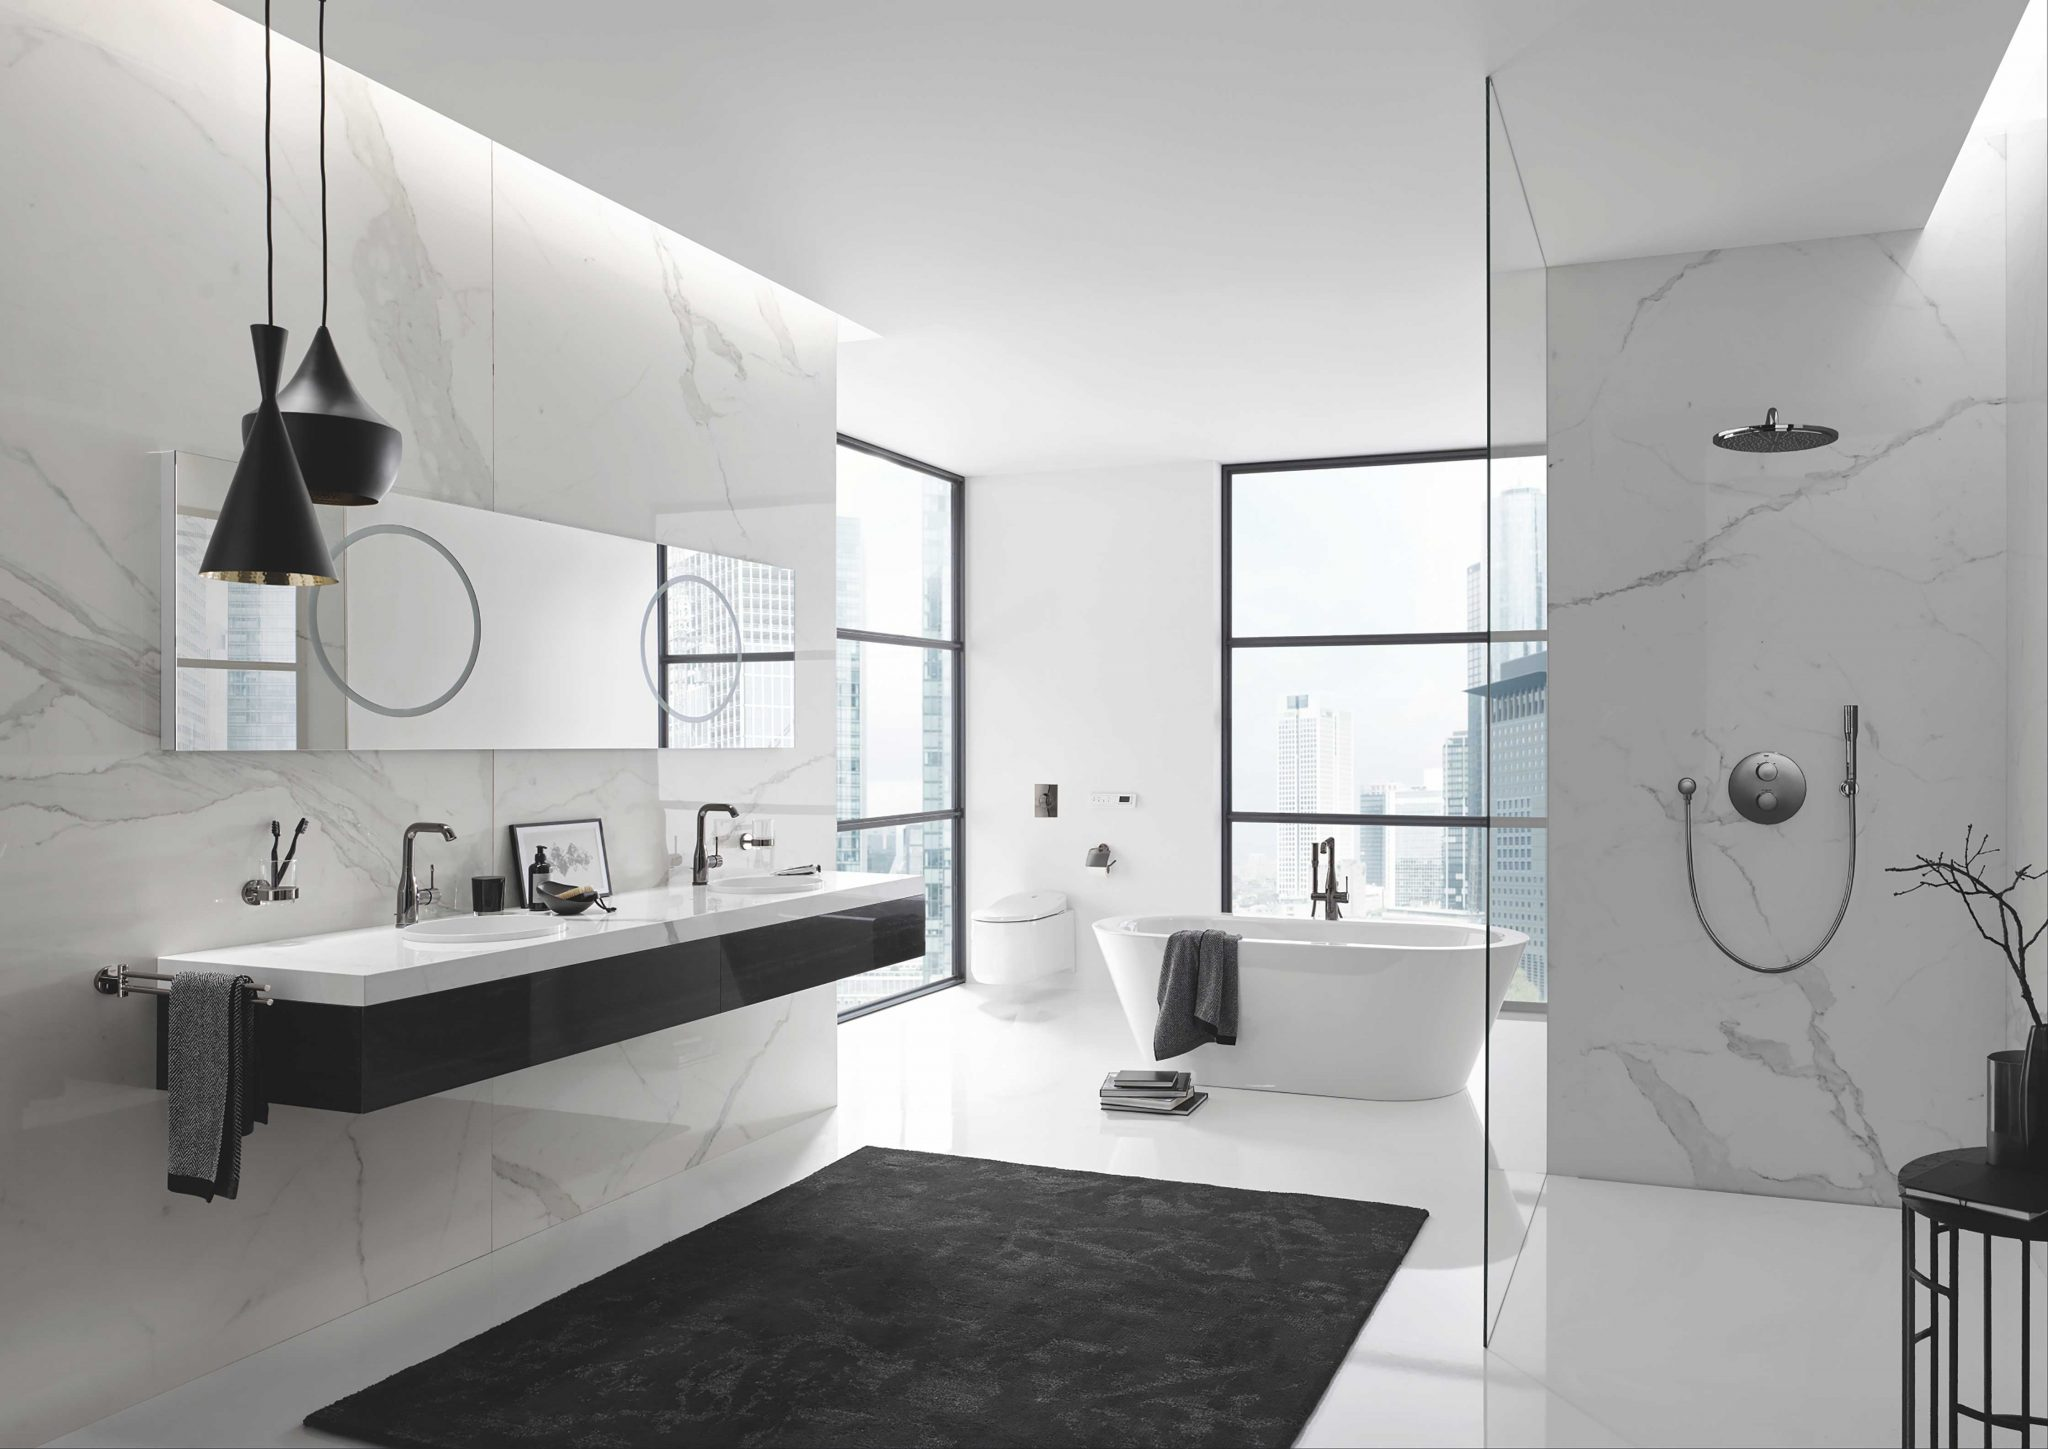 Badausstattung Badausstellung Sanitarbedarf Badmobel Reisser